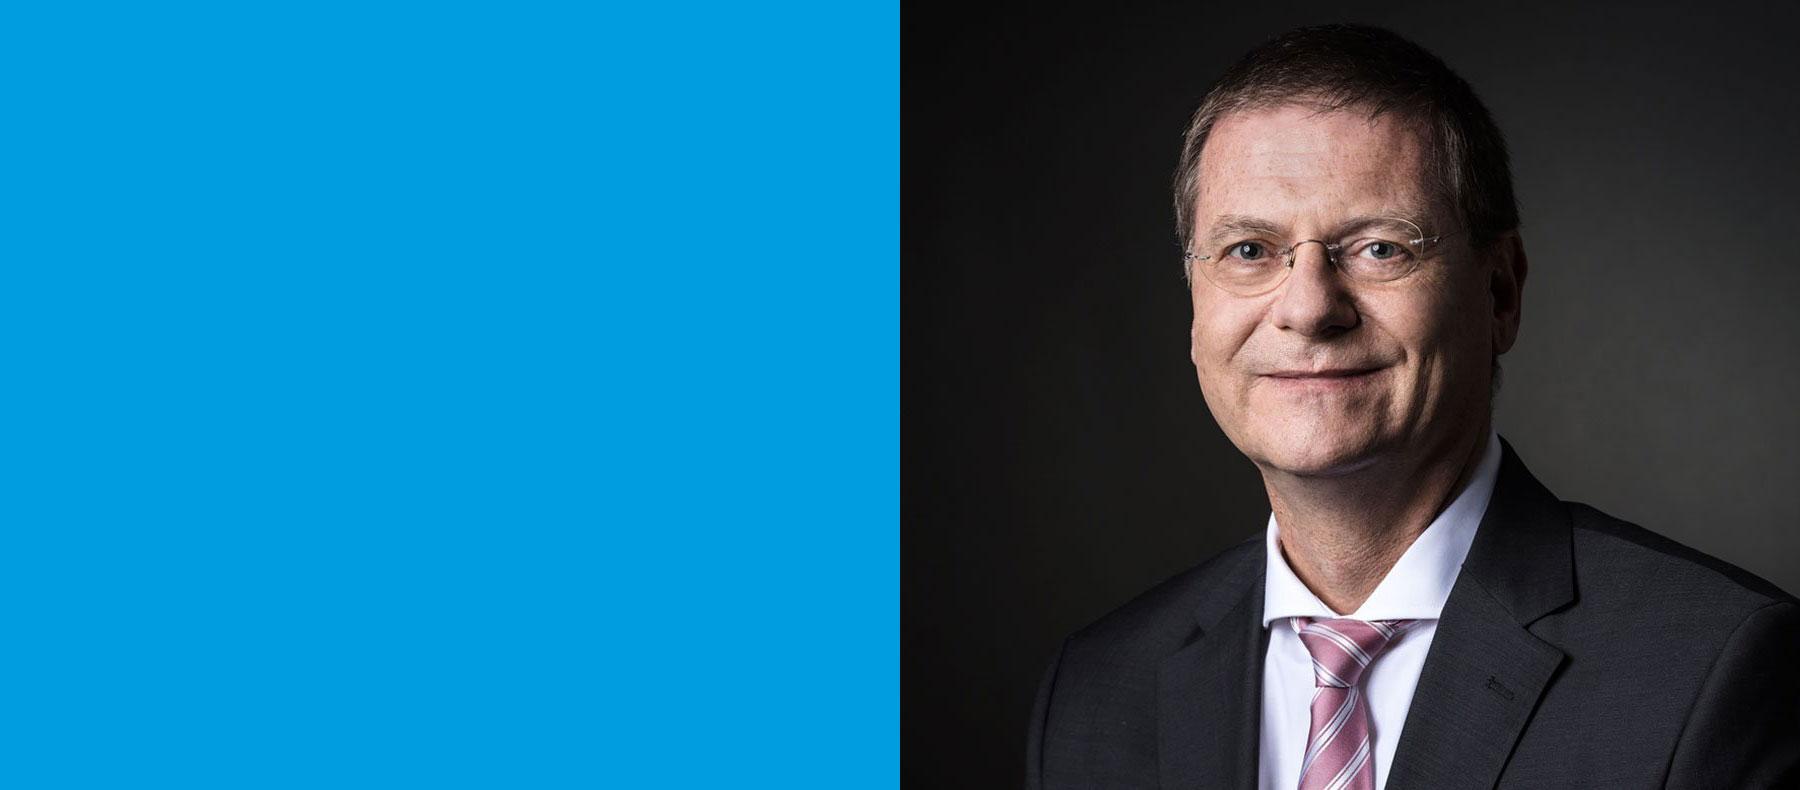 Rechtsanwalt Nürnberg Header Dr. Norbert Gieseler